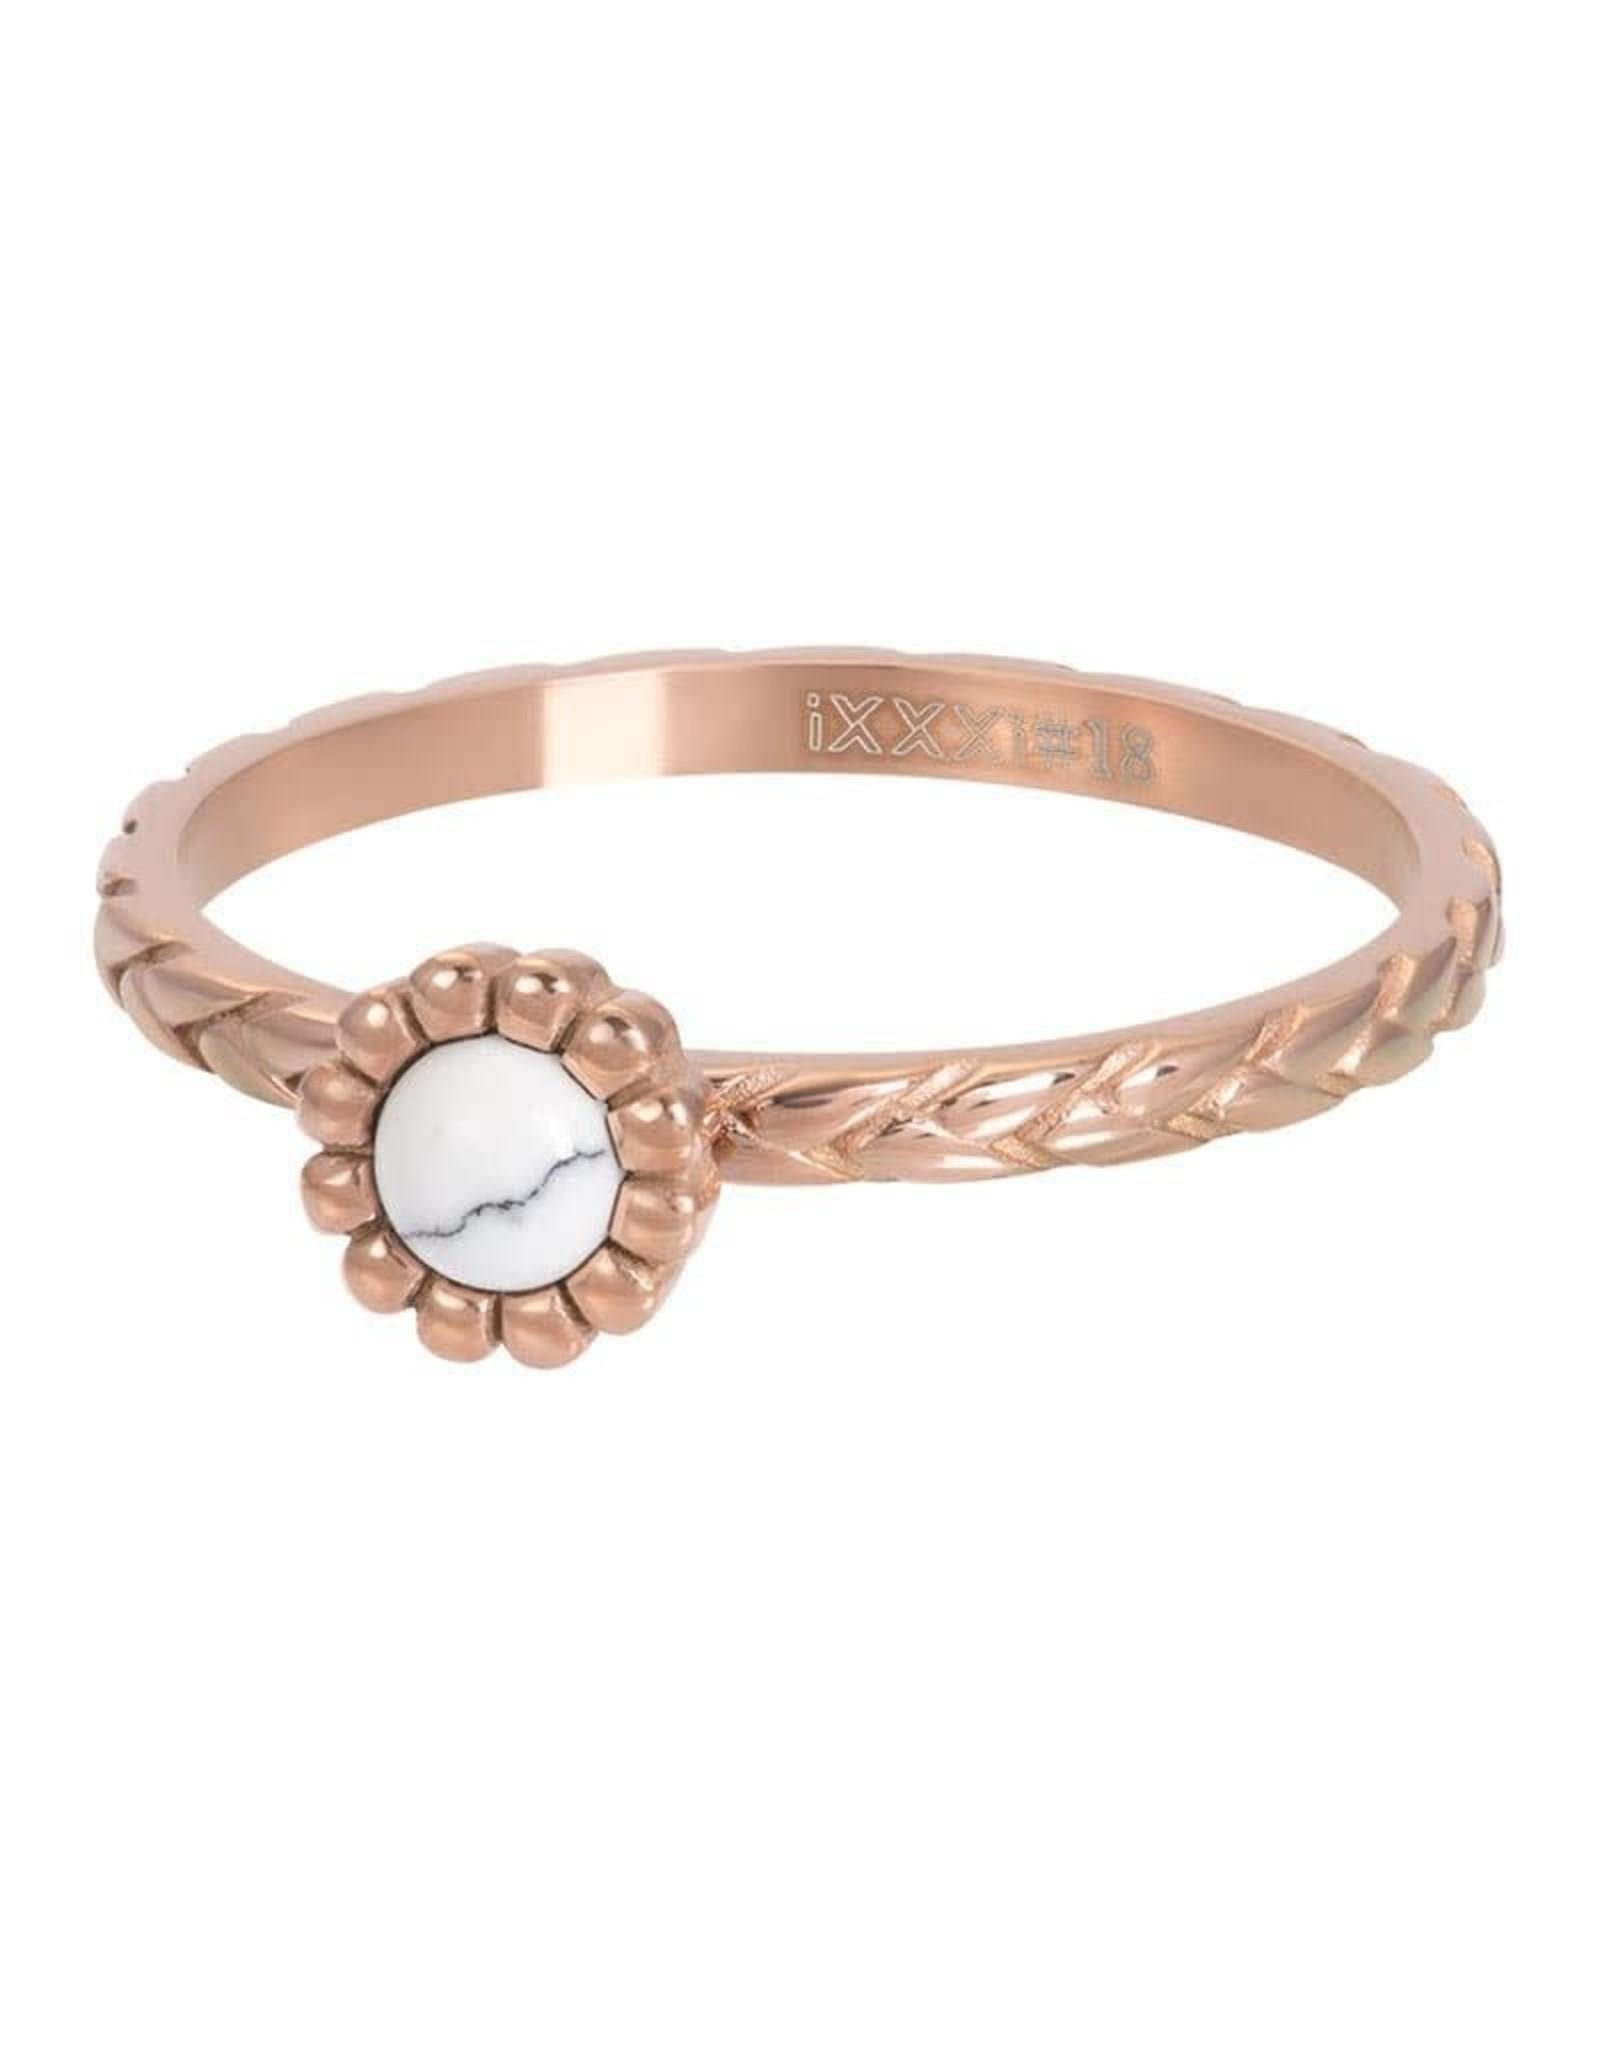 iXXXi Jewelry iXXXi vulring inspired white - rose